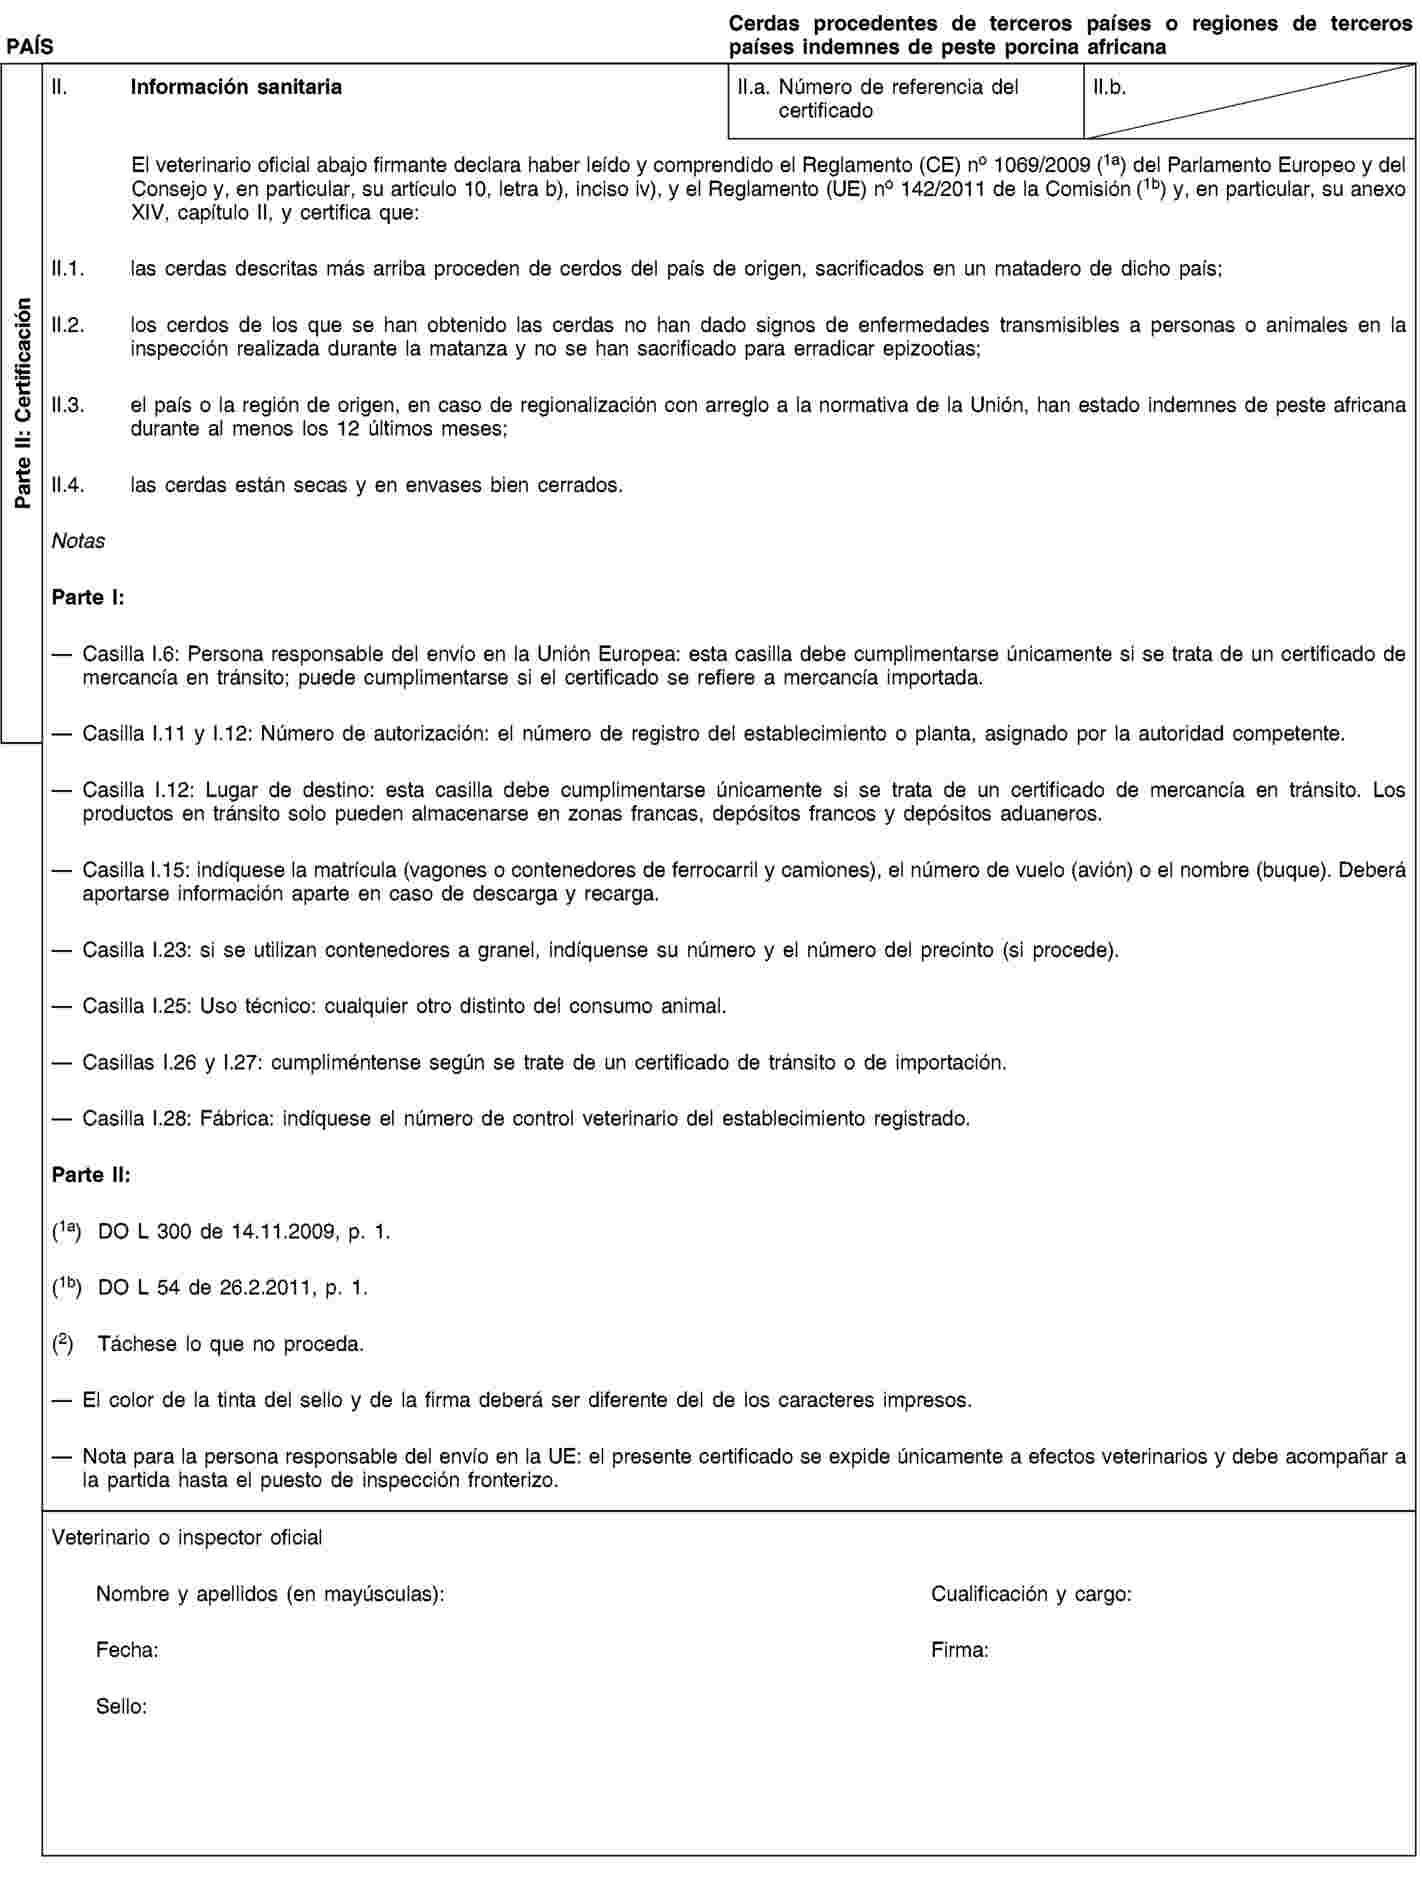 Imagen: https://eur-lex.europa.eu/resource.html?uri=uriserv:OJ.L_.2011.054.01.0001.01.SPA.xhtml.L_2011054ES.01019201.tif.jpg